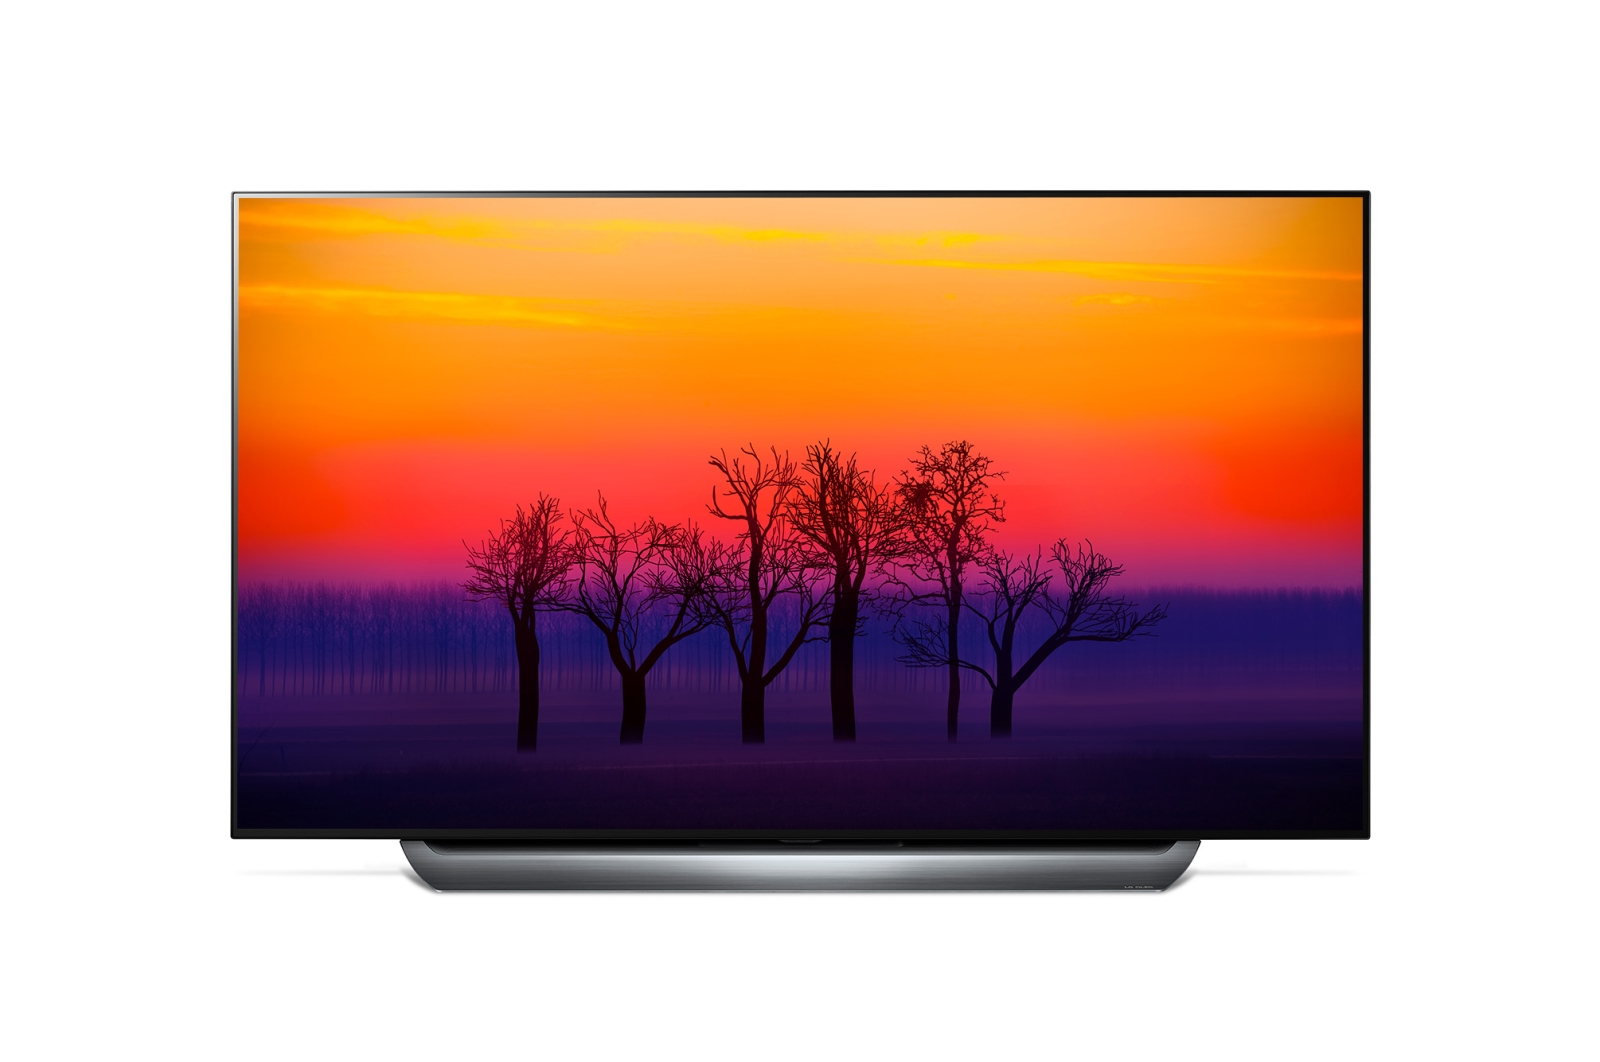 цена на Телевизор LG OLED55C8 LED 55 Titanium, Smart TV, 16:9, 3840x2160, USB, HDMI, Wi-Fi, RJ-45, DVB-T, T2, C, S, S2